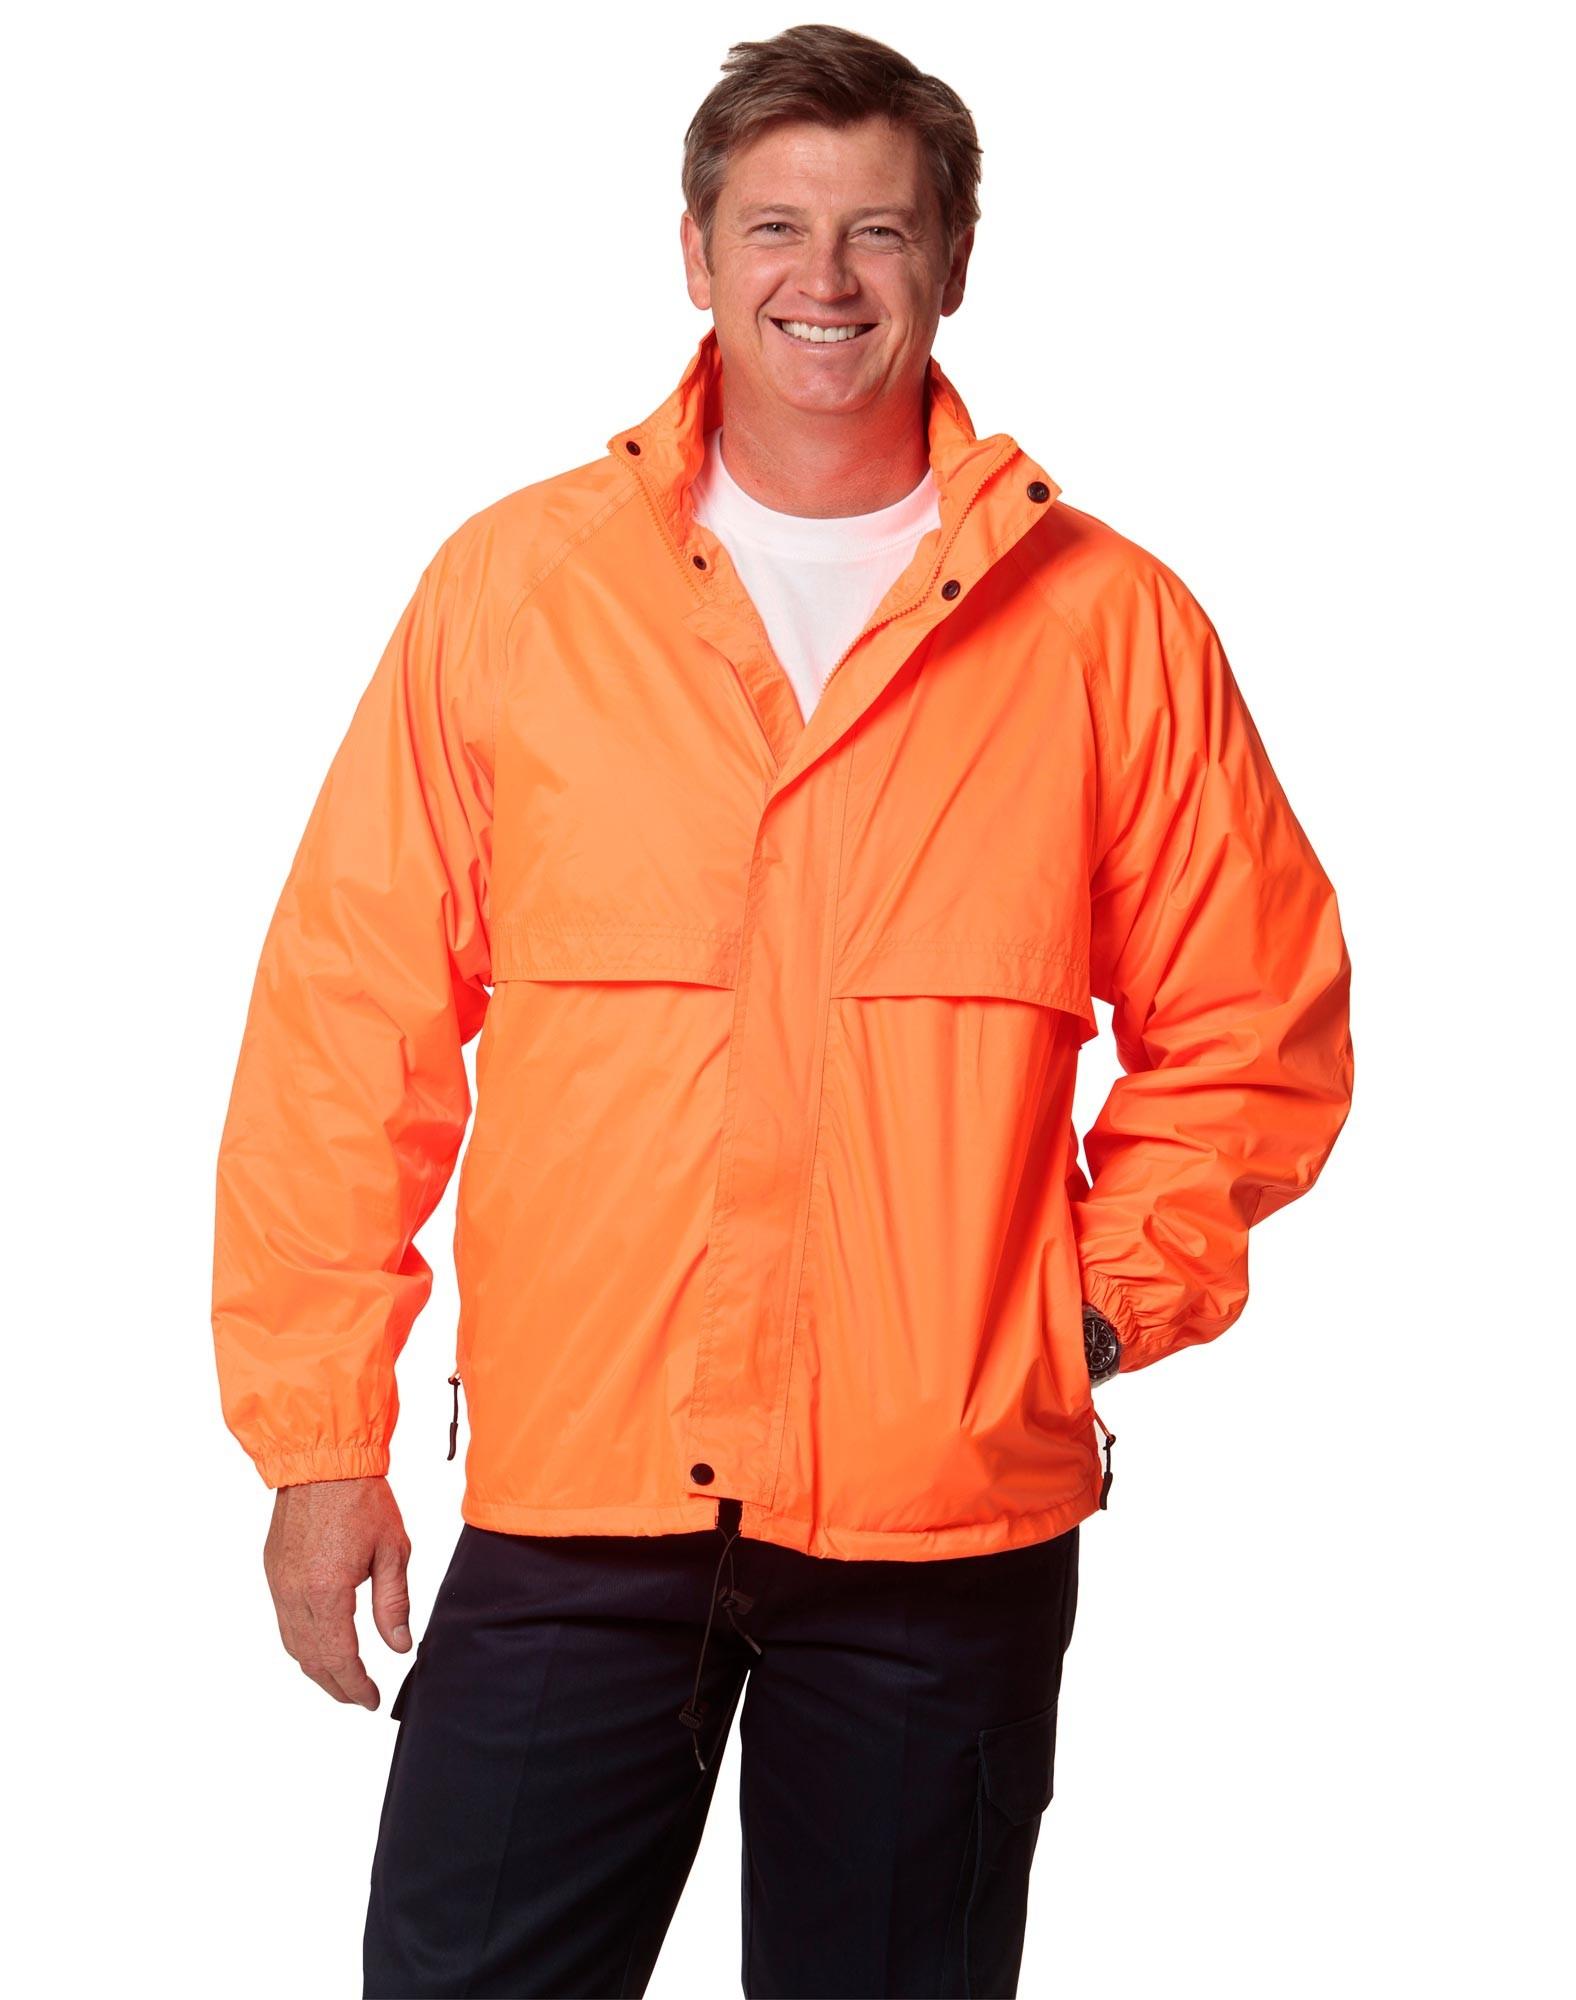 Men's High Visibility Spray Jacket